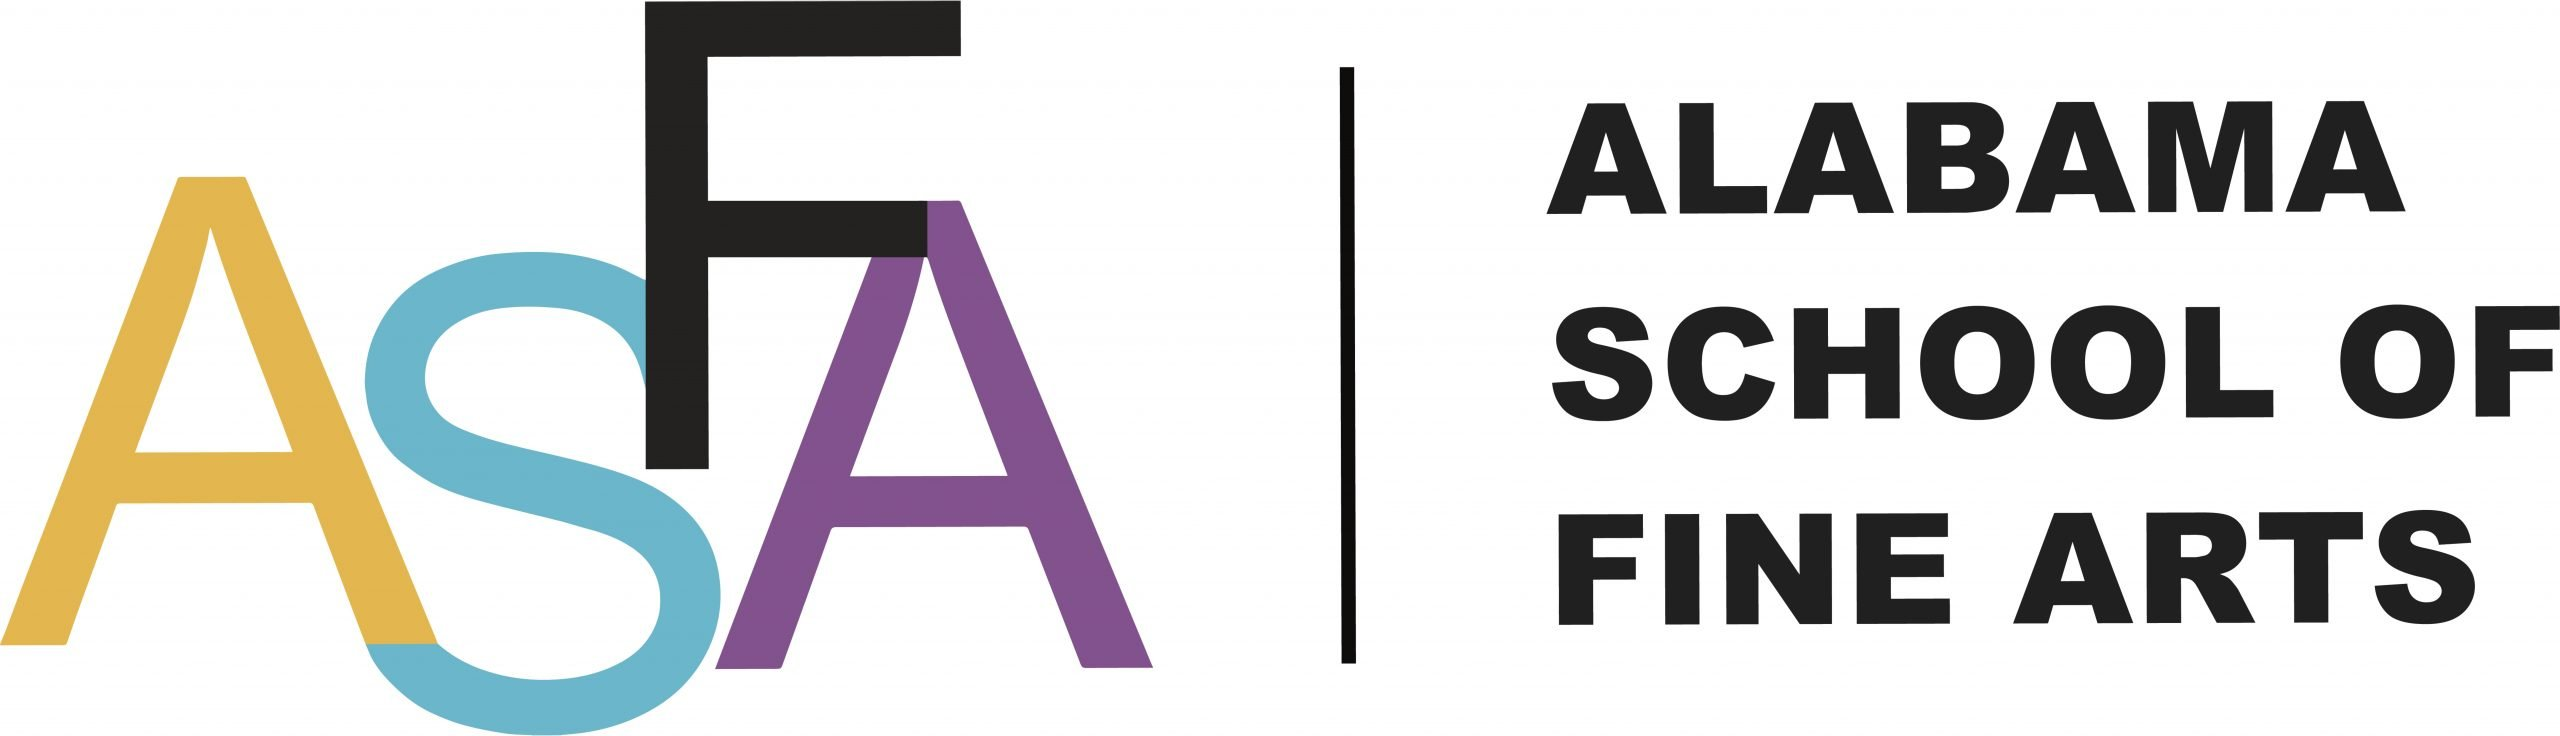 Alabama School of Fine Arts